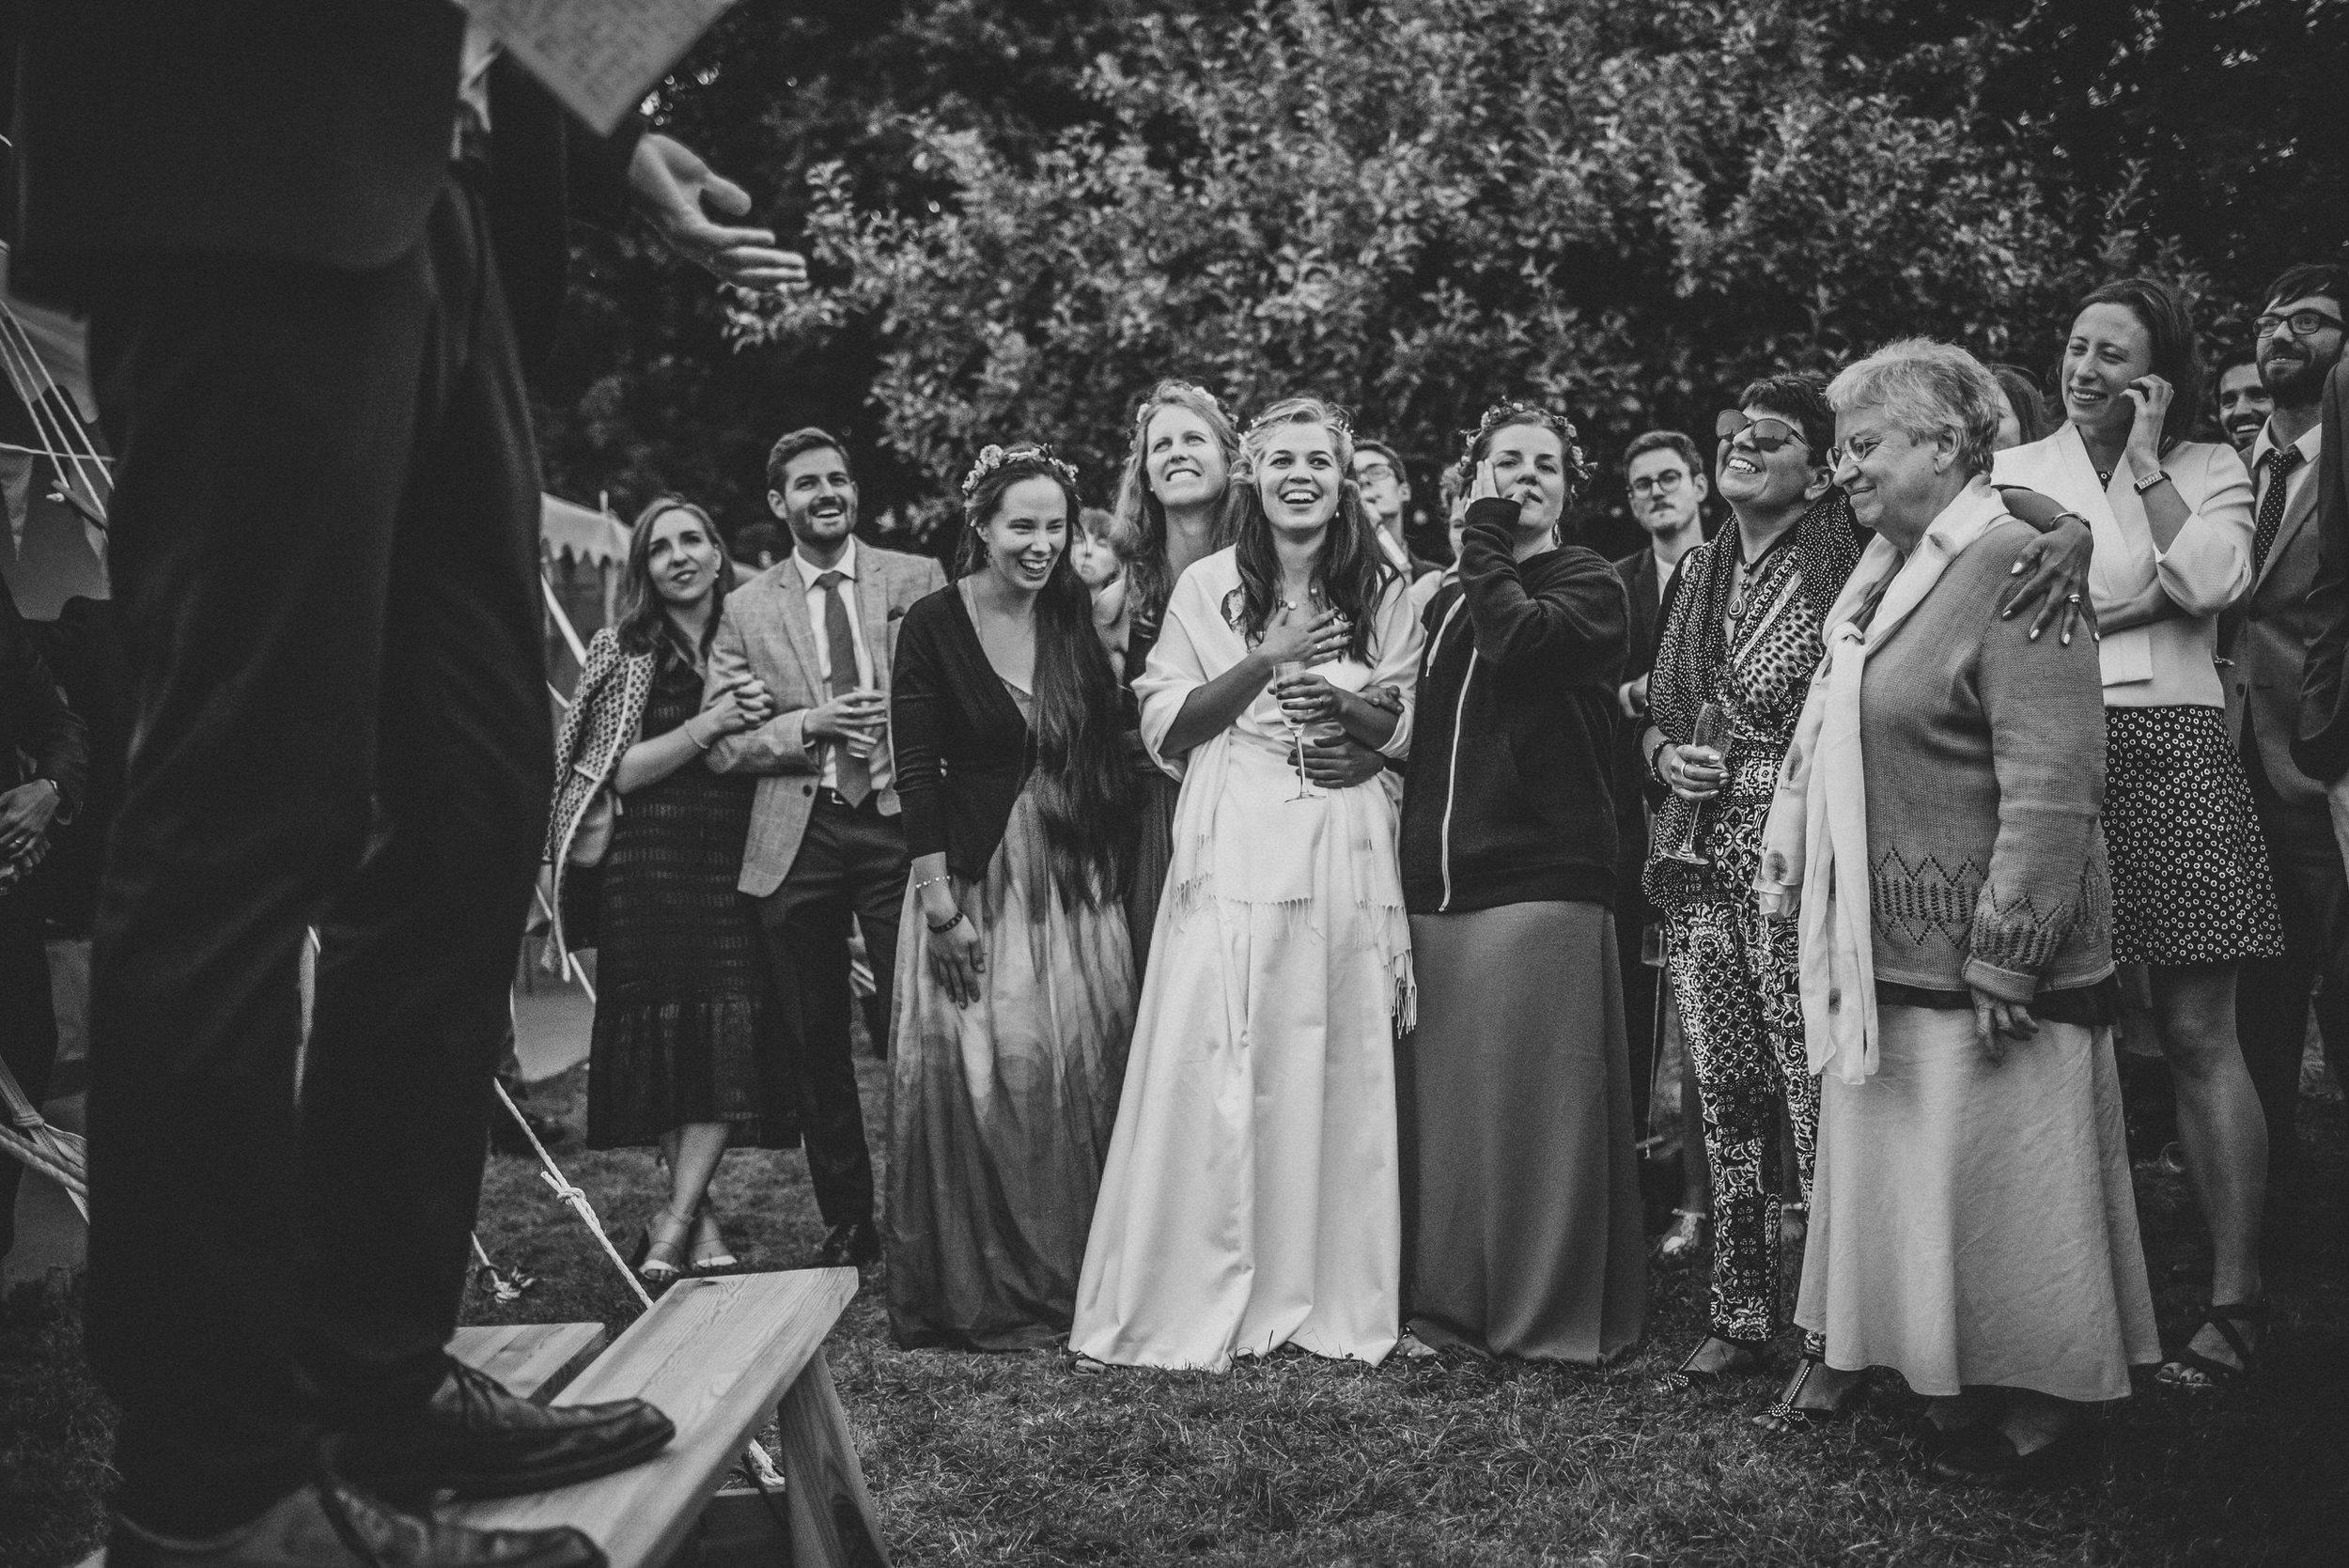 knepp-castle-boho-outdoor-wedding-602.jpg